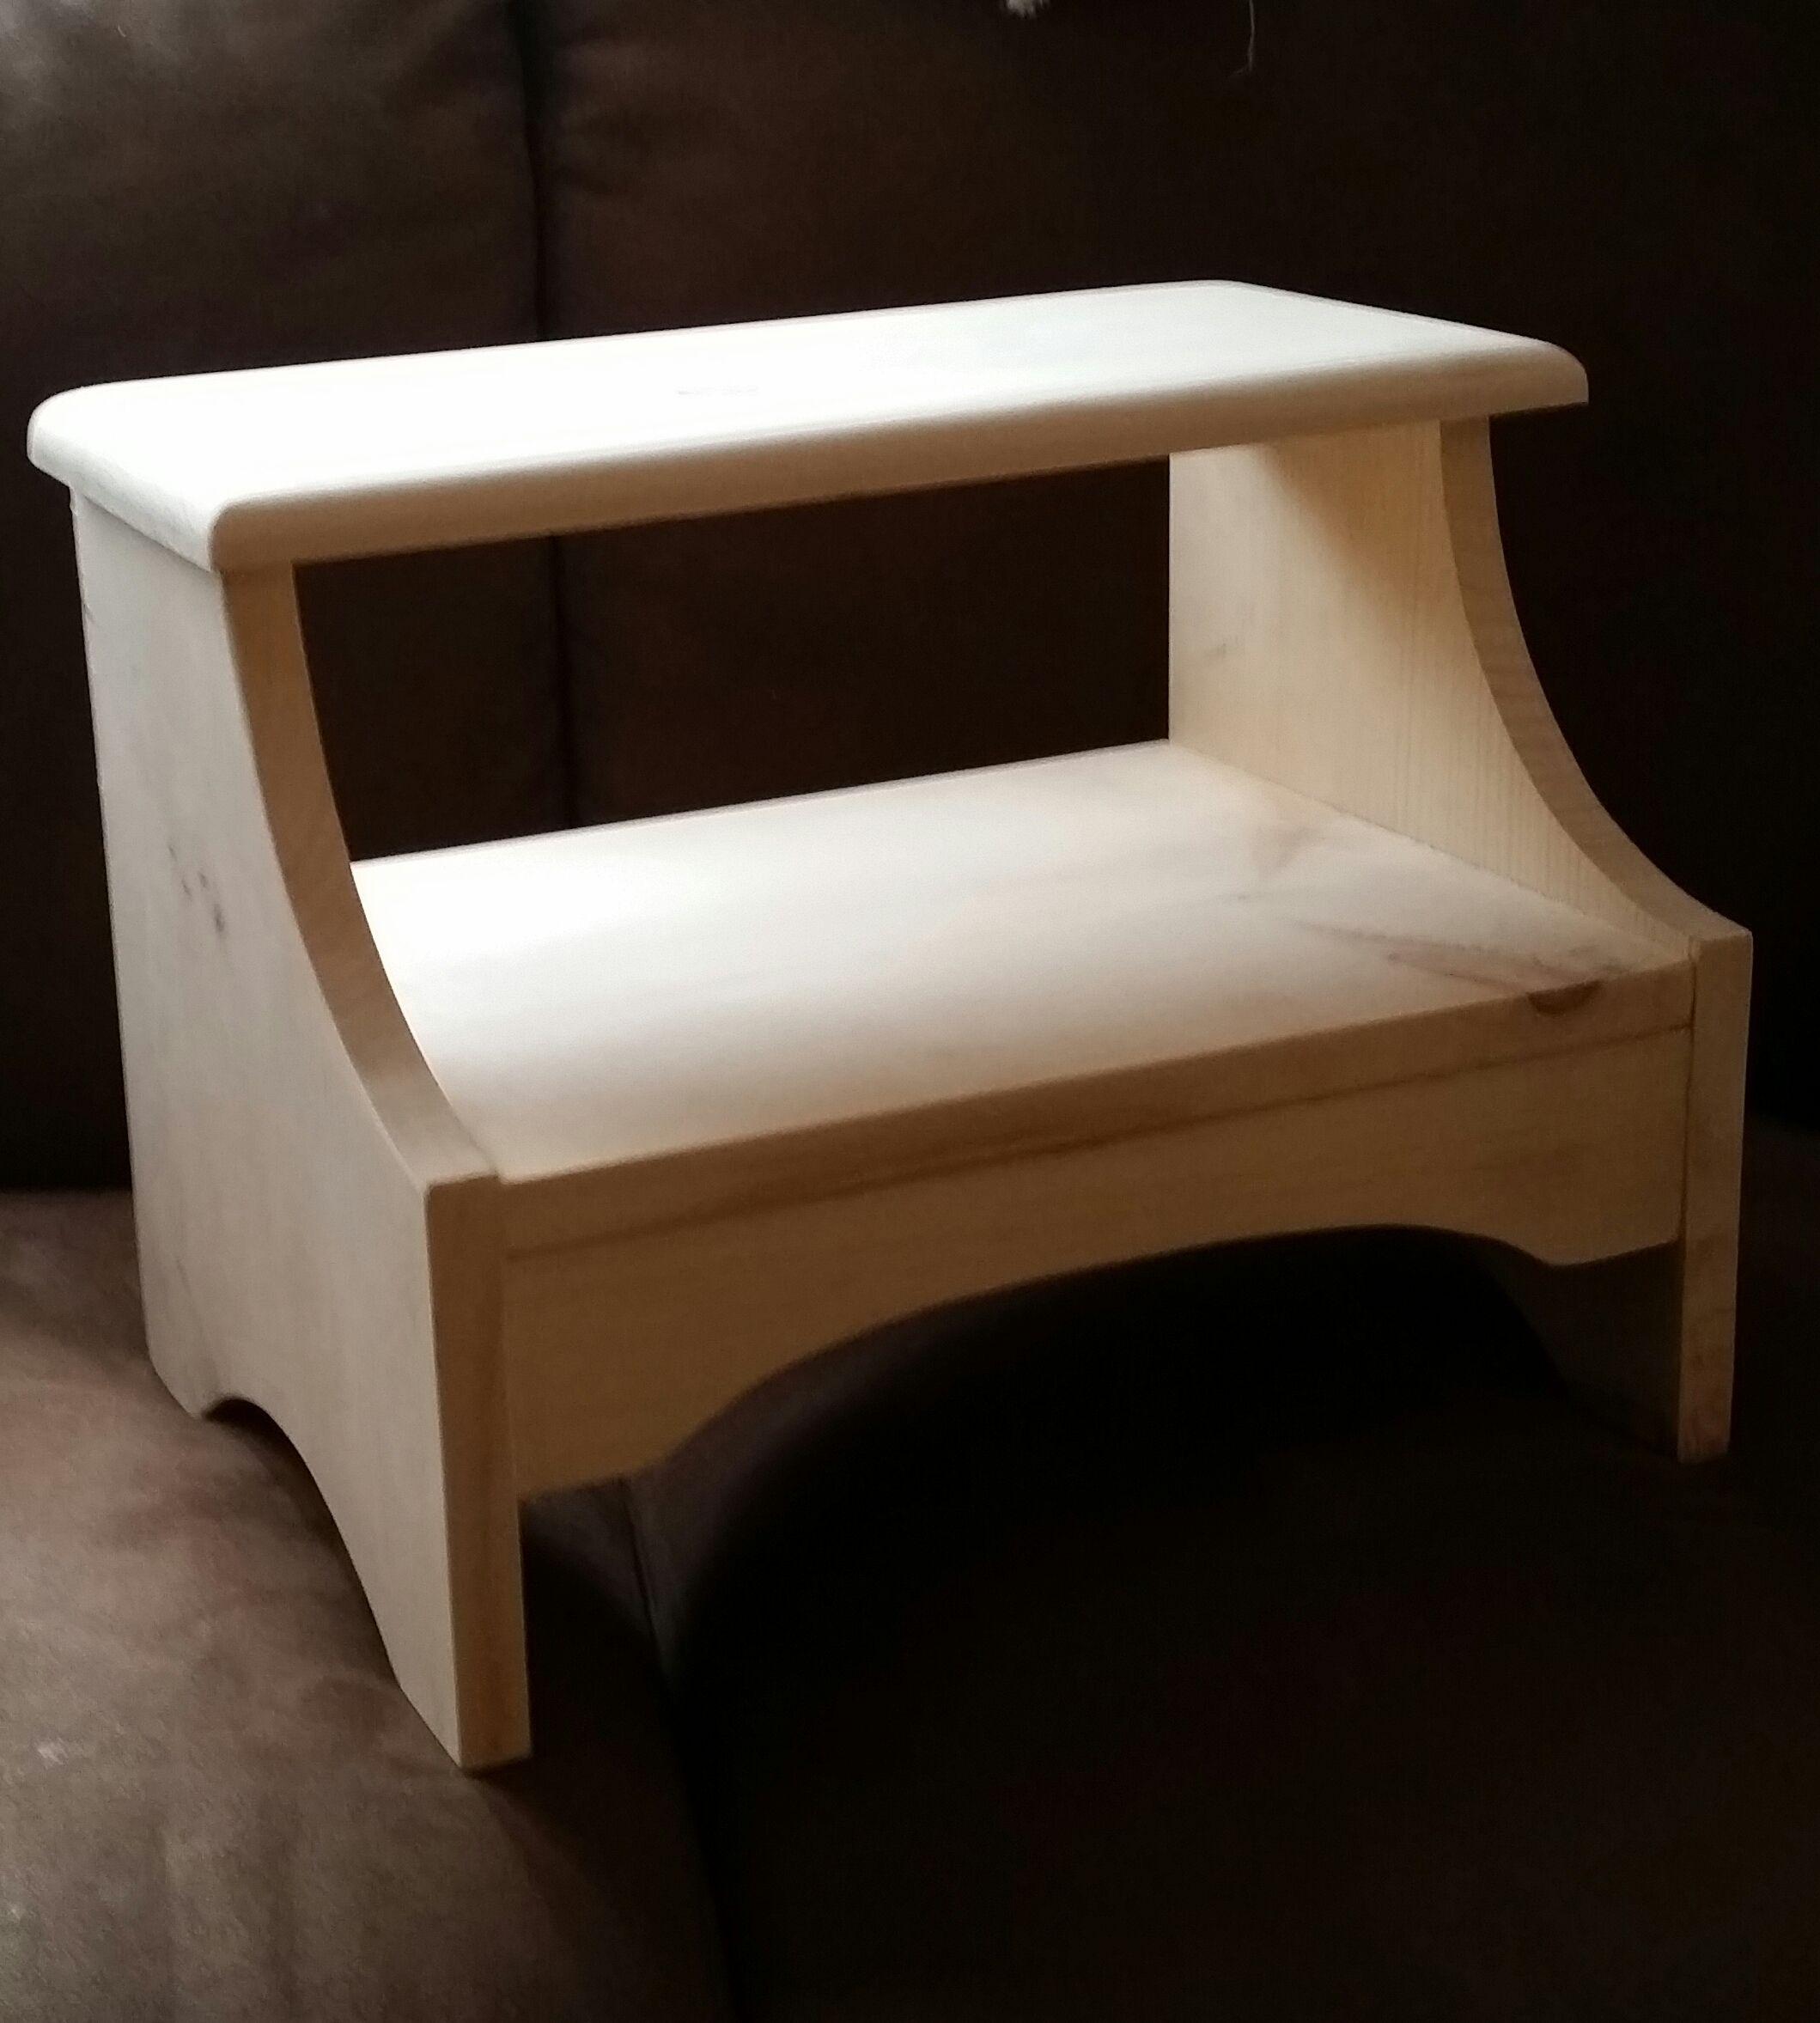 Custom Made Pine Bedside Step Stool